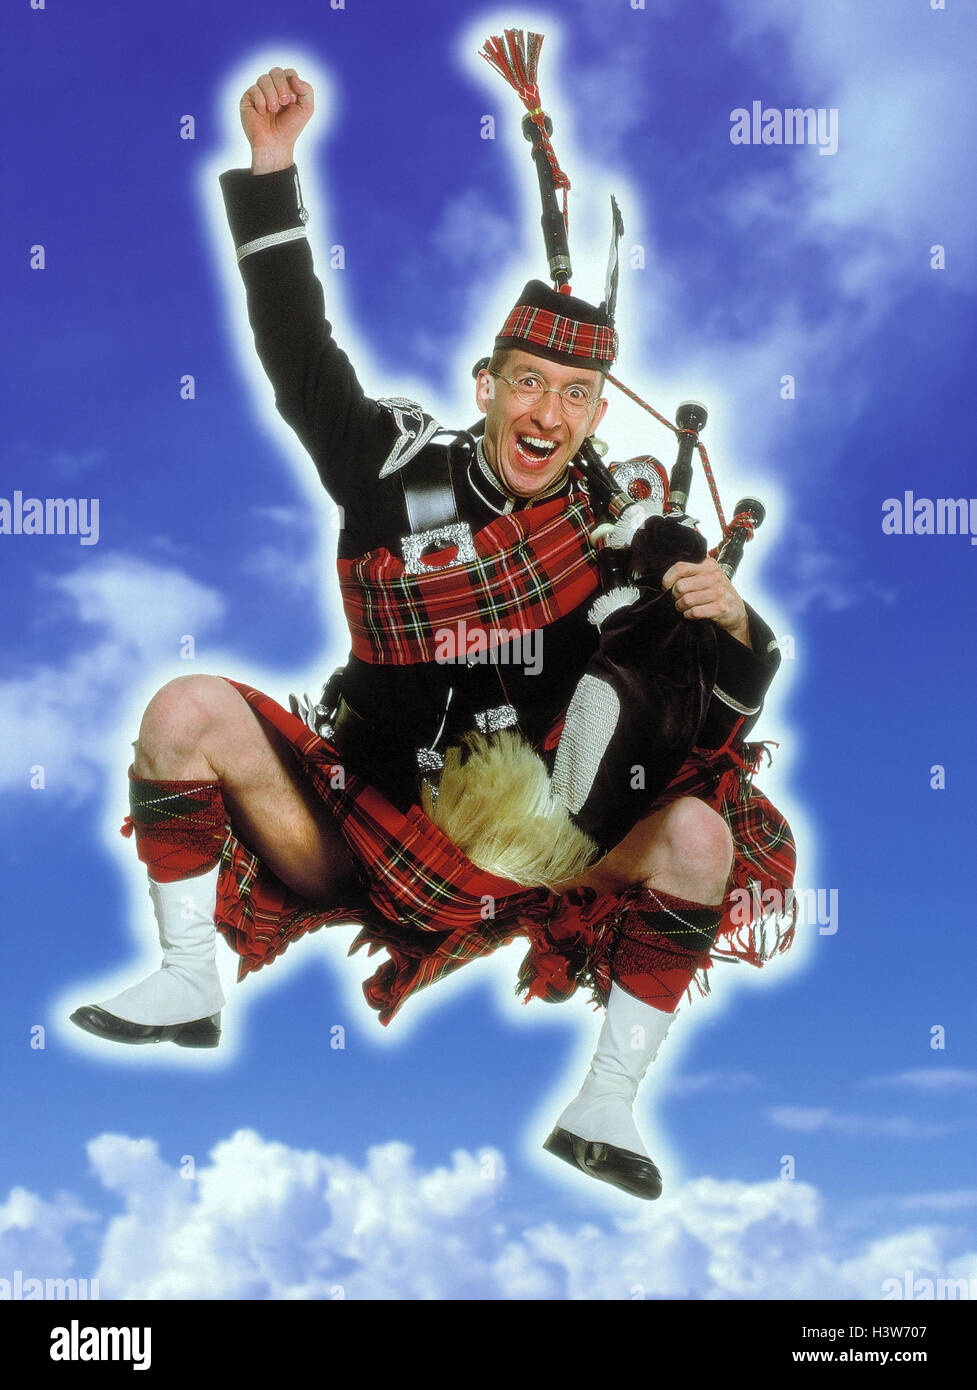 Schotten, Kilt, Dudelsack, Kapern, Geste, Begeisterung, bewölkten Himmel Studio, Mann, Tracht, Kleidung, traditionell, Stockbild